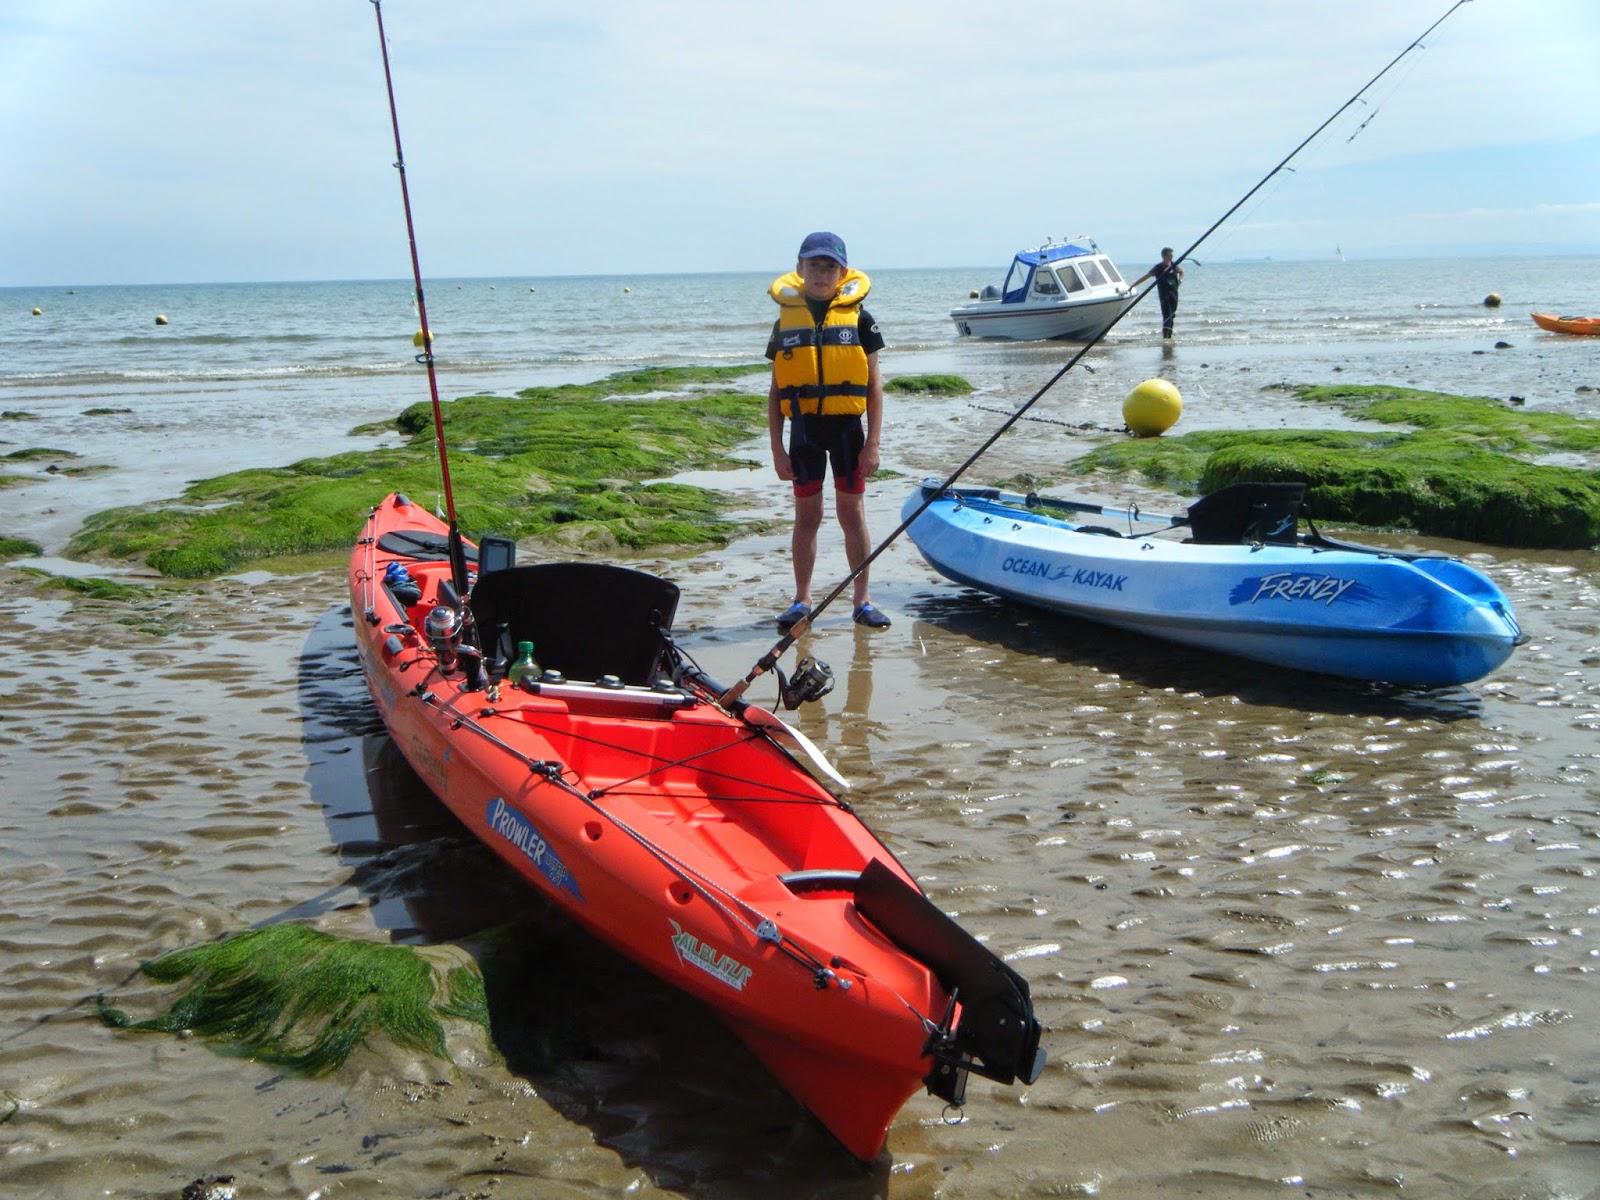 Ocean kayak uk fishing team july 2014 for Ocean kayak fishing